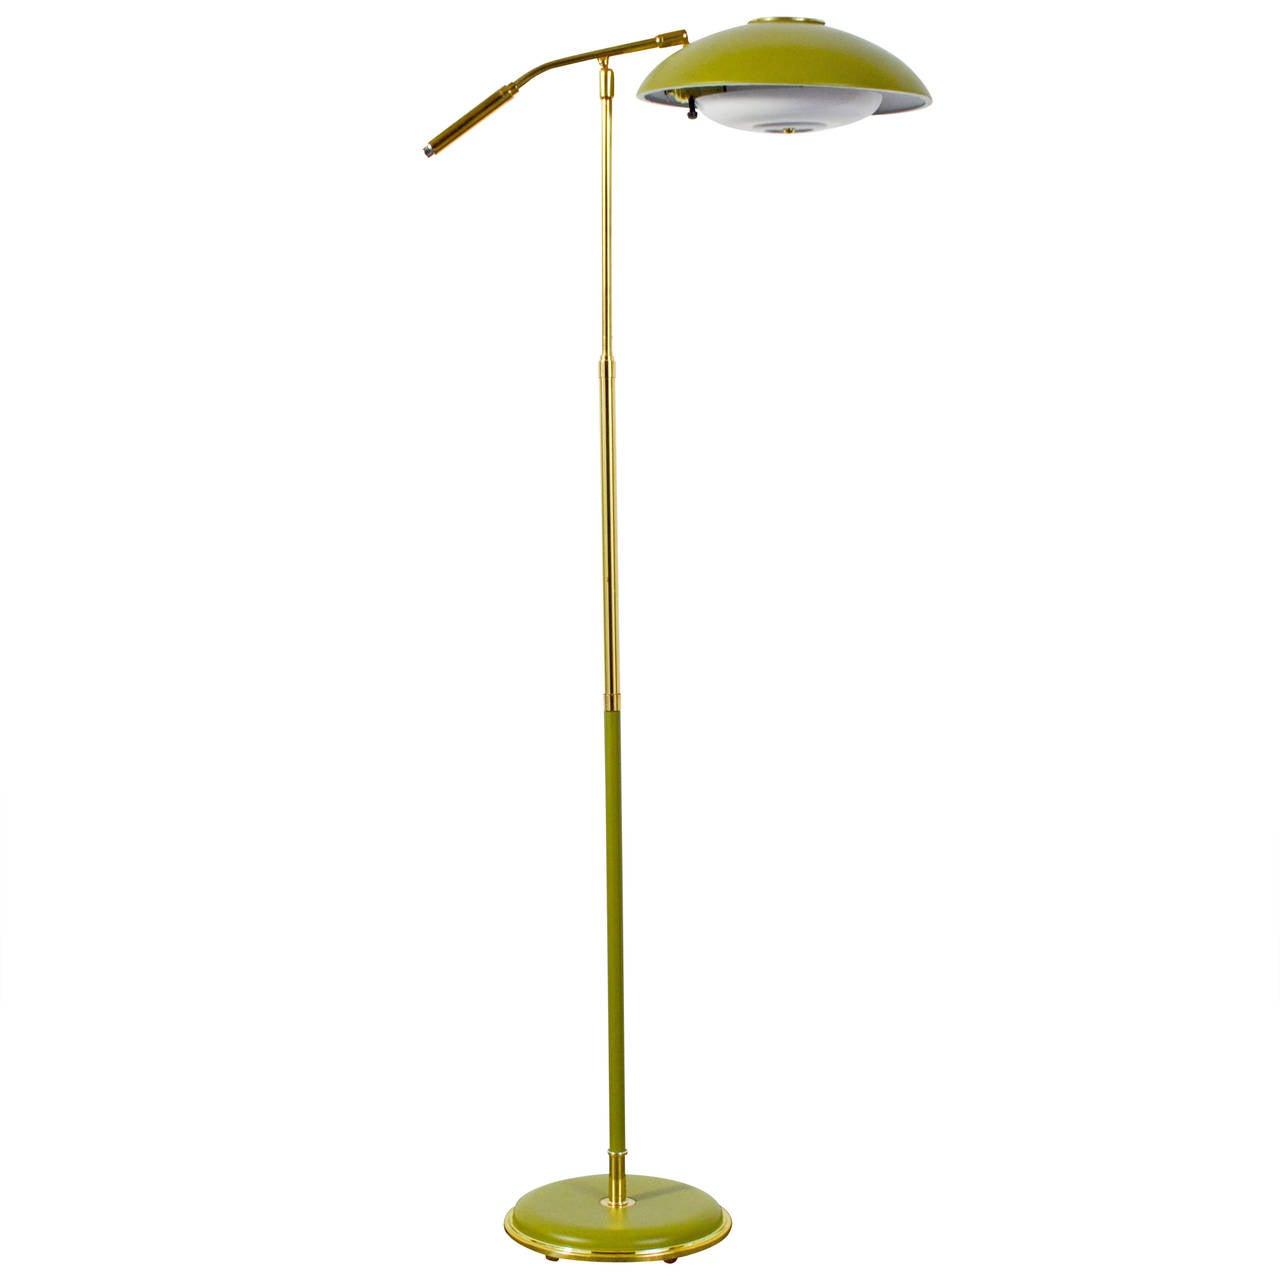 Vintage mid century floor lamp at 1stdibs for Roosevelt 1 light floor lamp